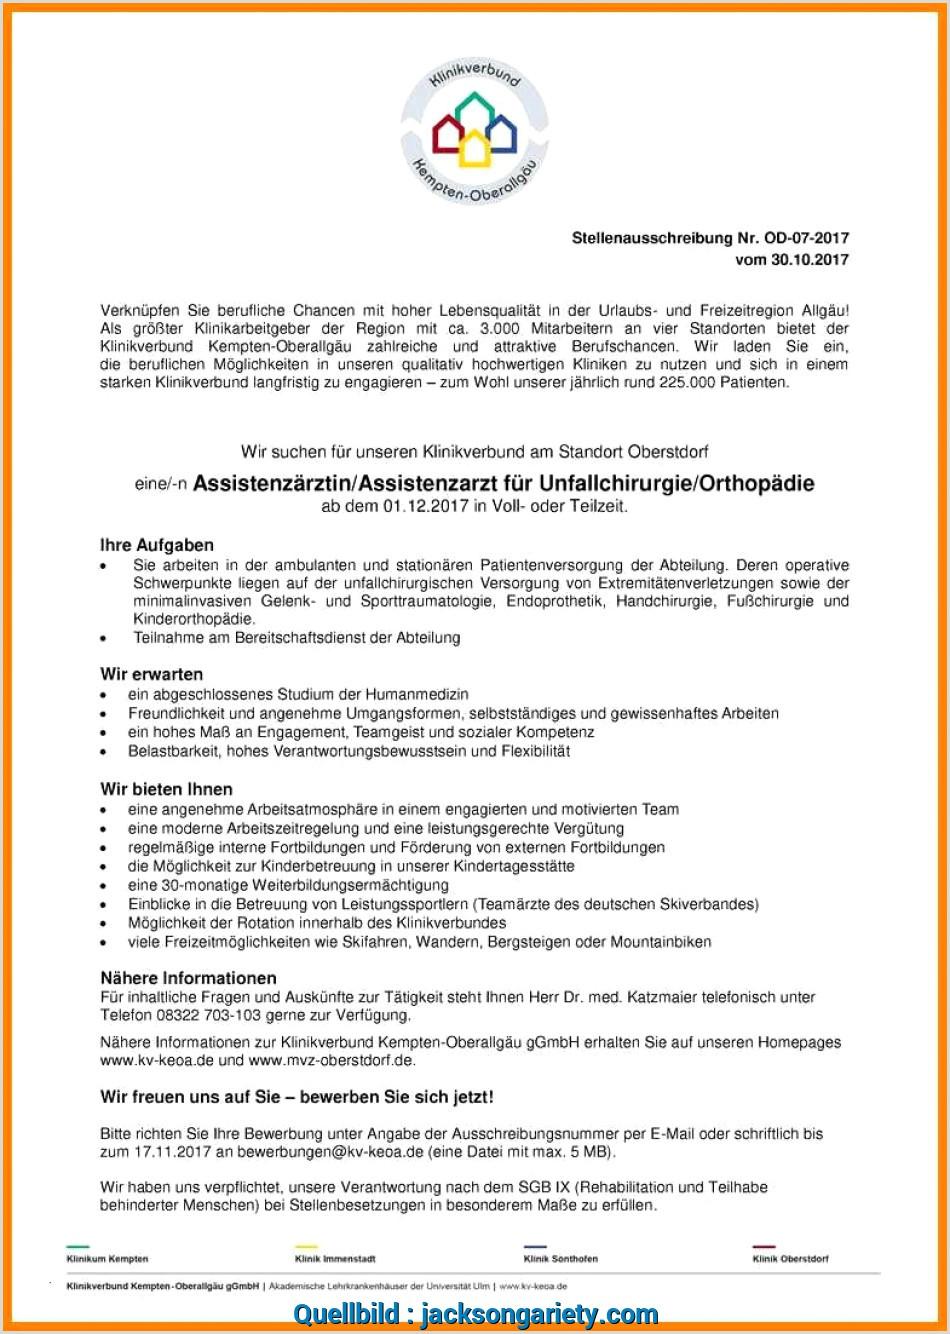 Original Bewerbung Abistenzarzt Assistenzarzt Od 07 Mvz